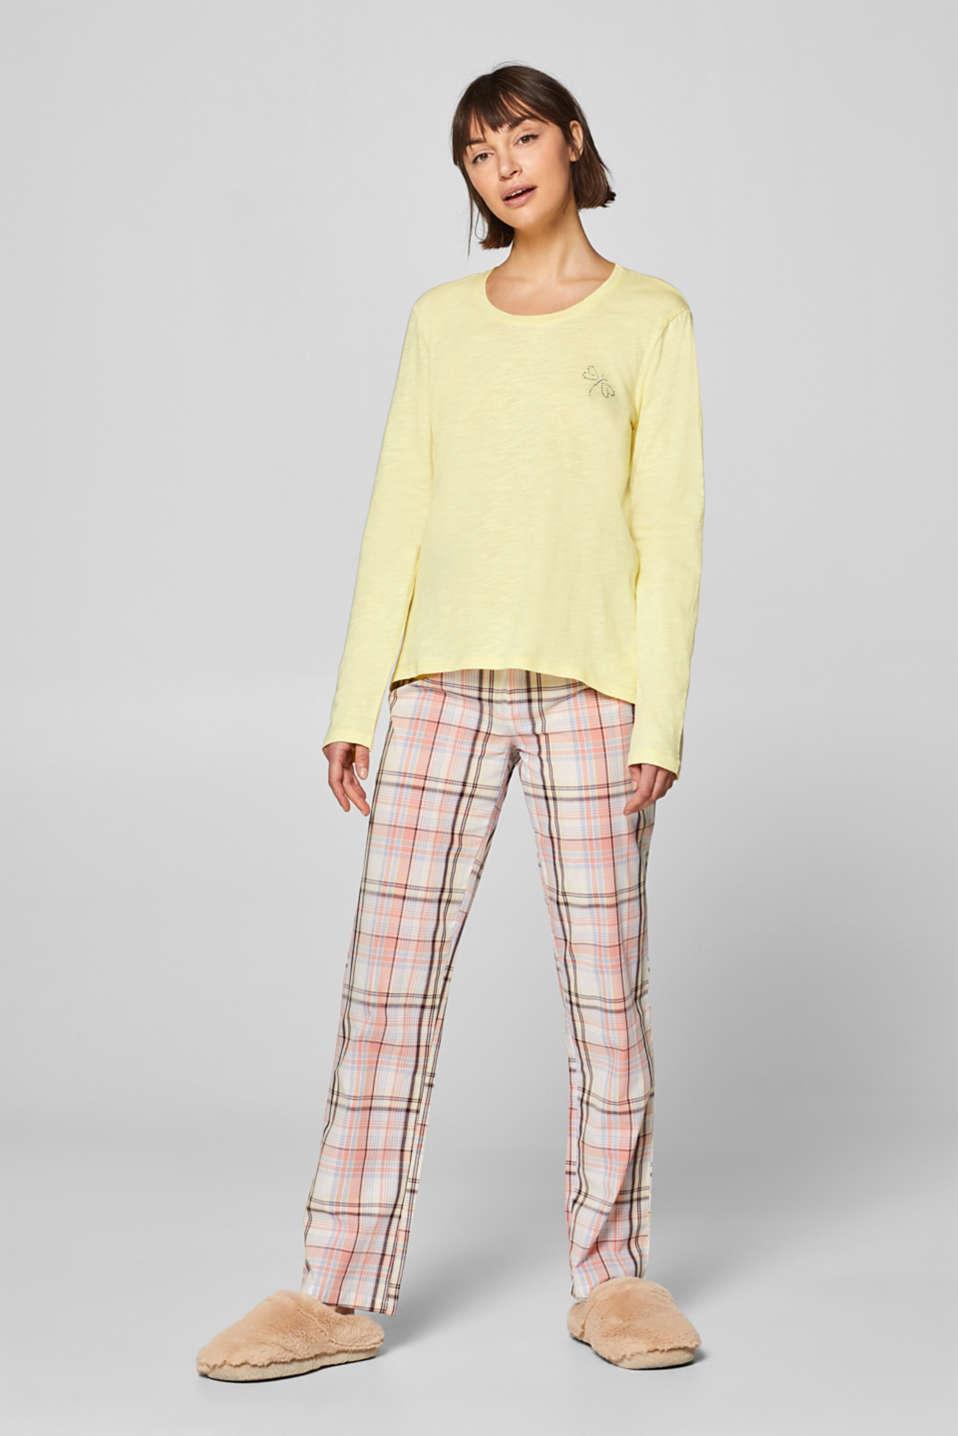 Pyjamas in a lightweight mix of materials, 100% cotton